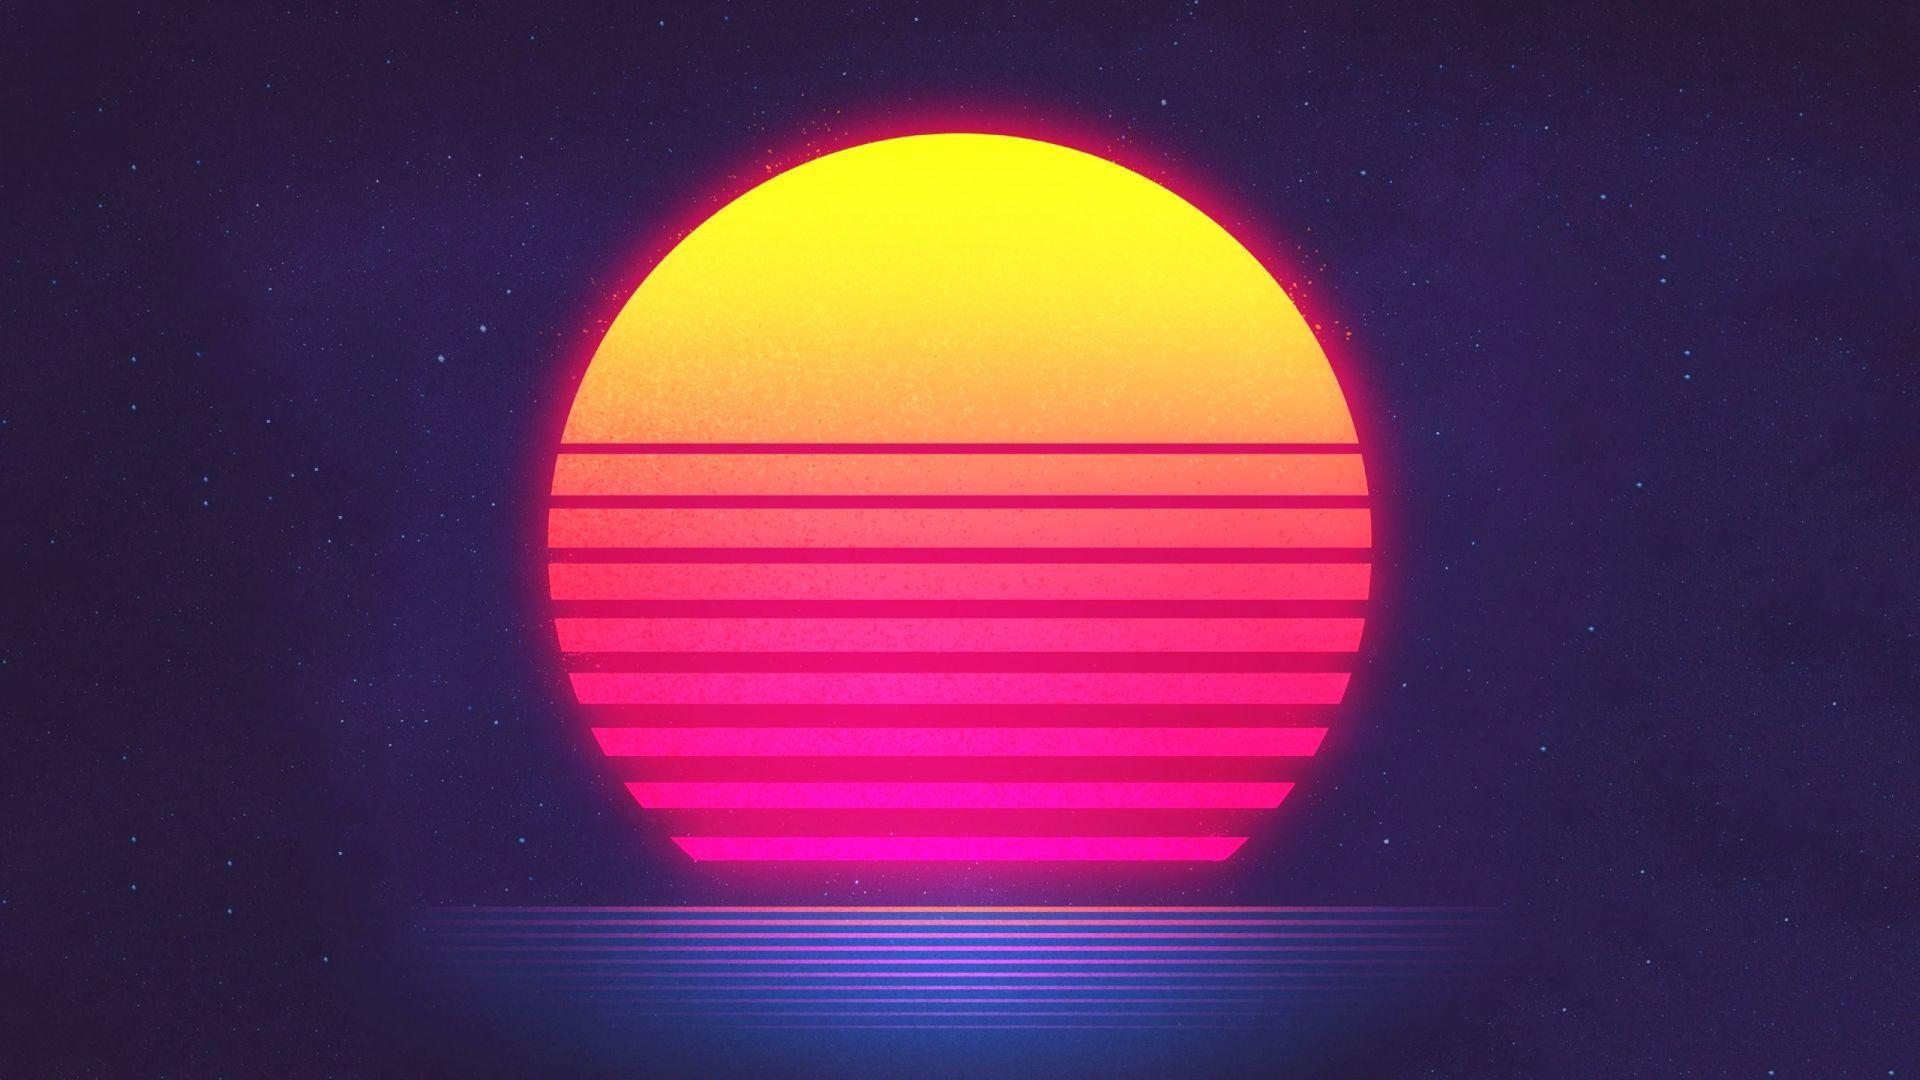 Sunset Retrowave Synthwave Hd Retro Waves Synthwave Sun Illustration